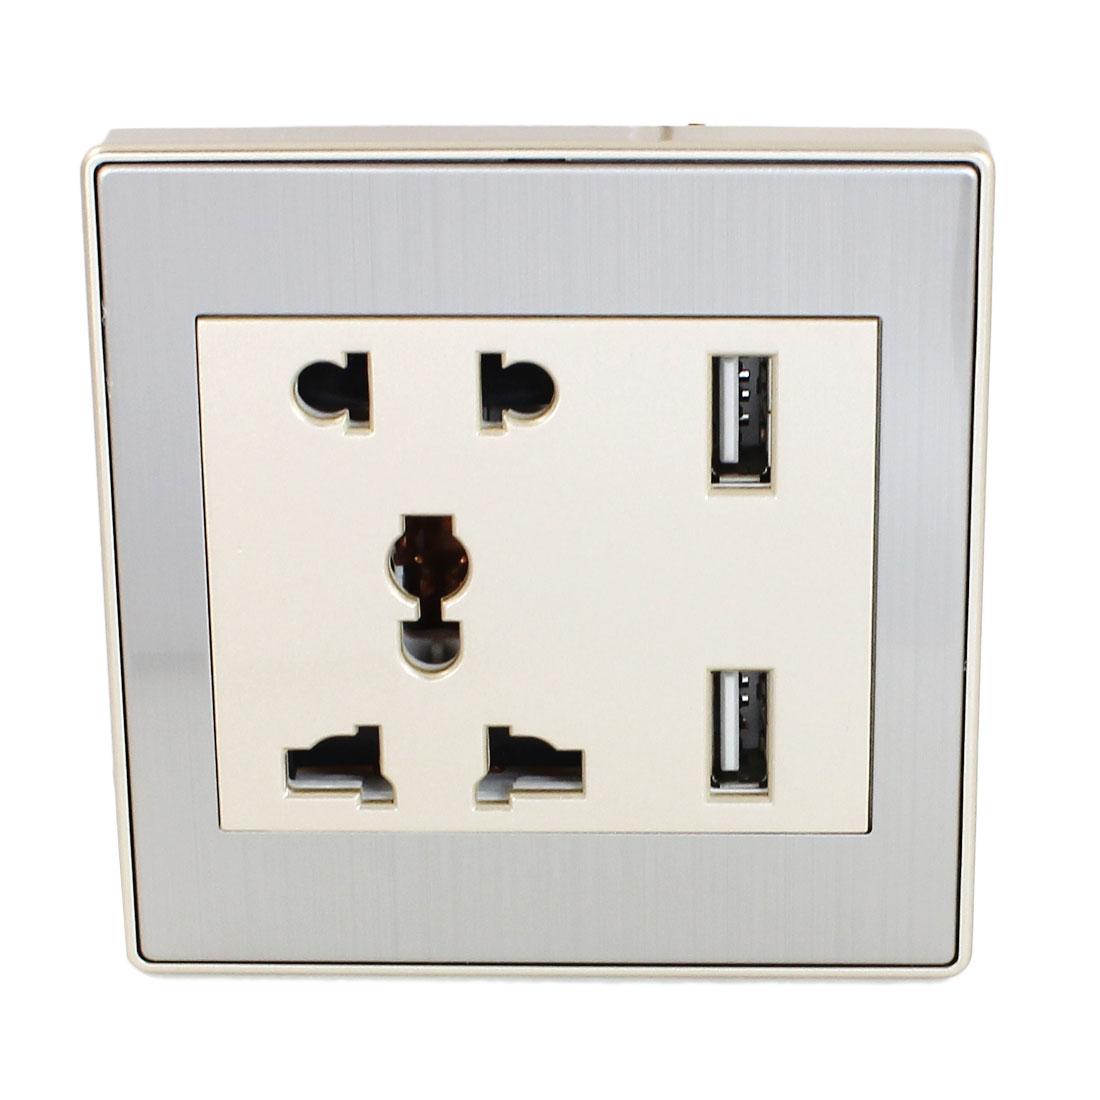 AC 110V-250V AU EU UK US Socket 2 USB Port Charger DC 5V 1000mA Mains Power Gold Tone